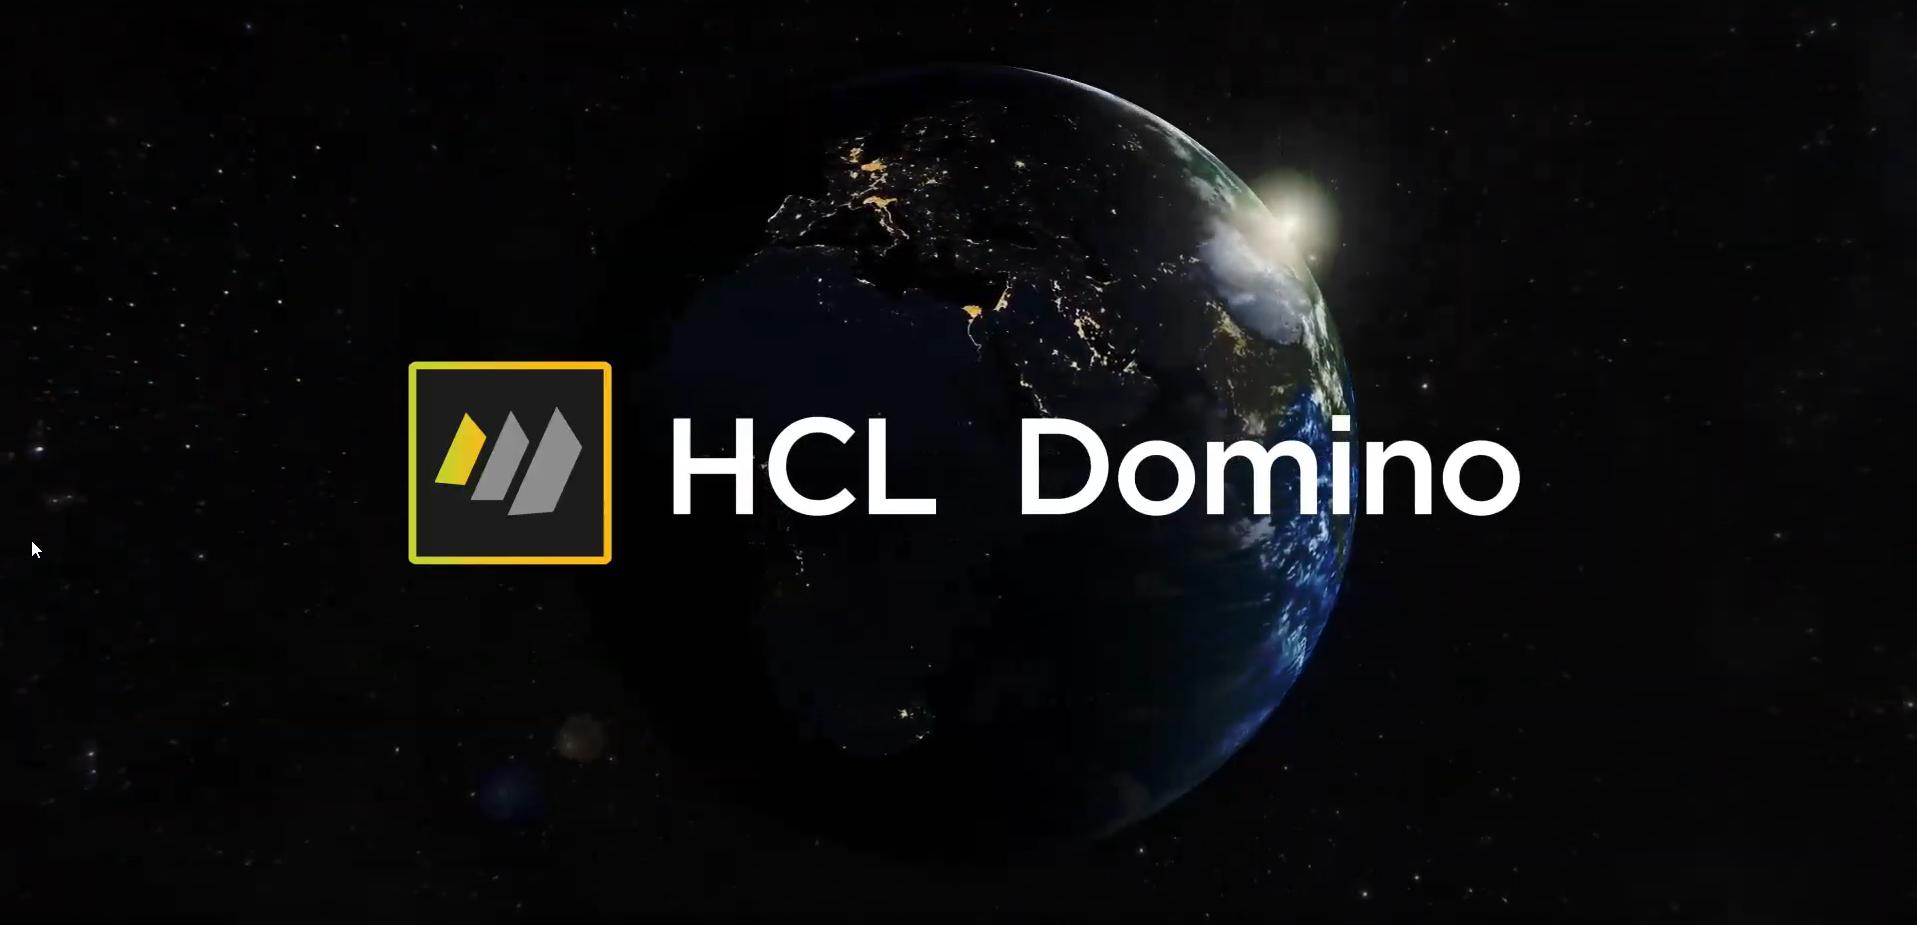 Domino V11 launch